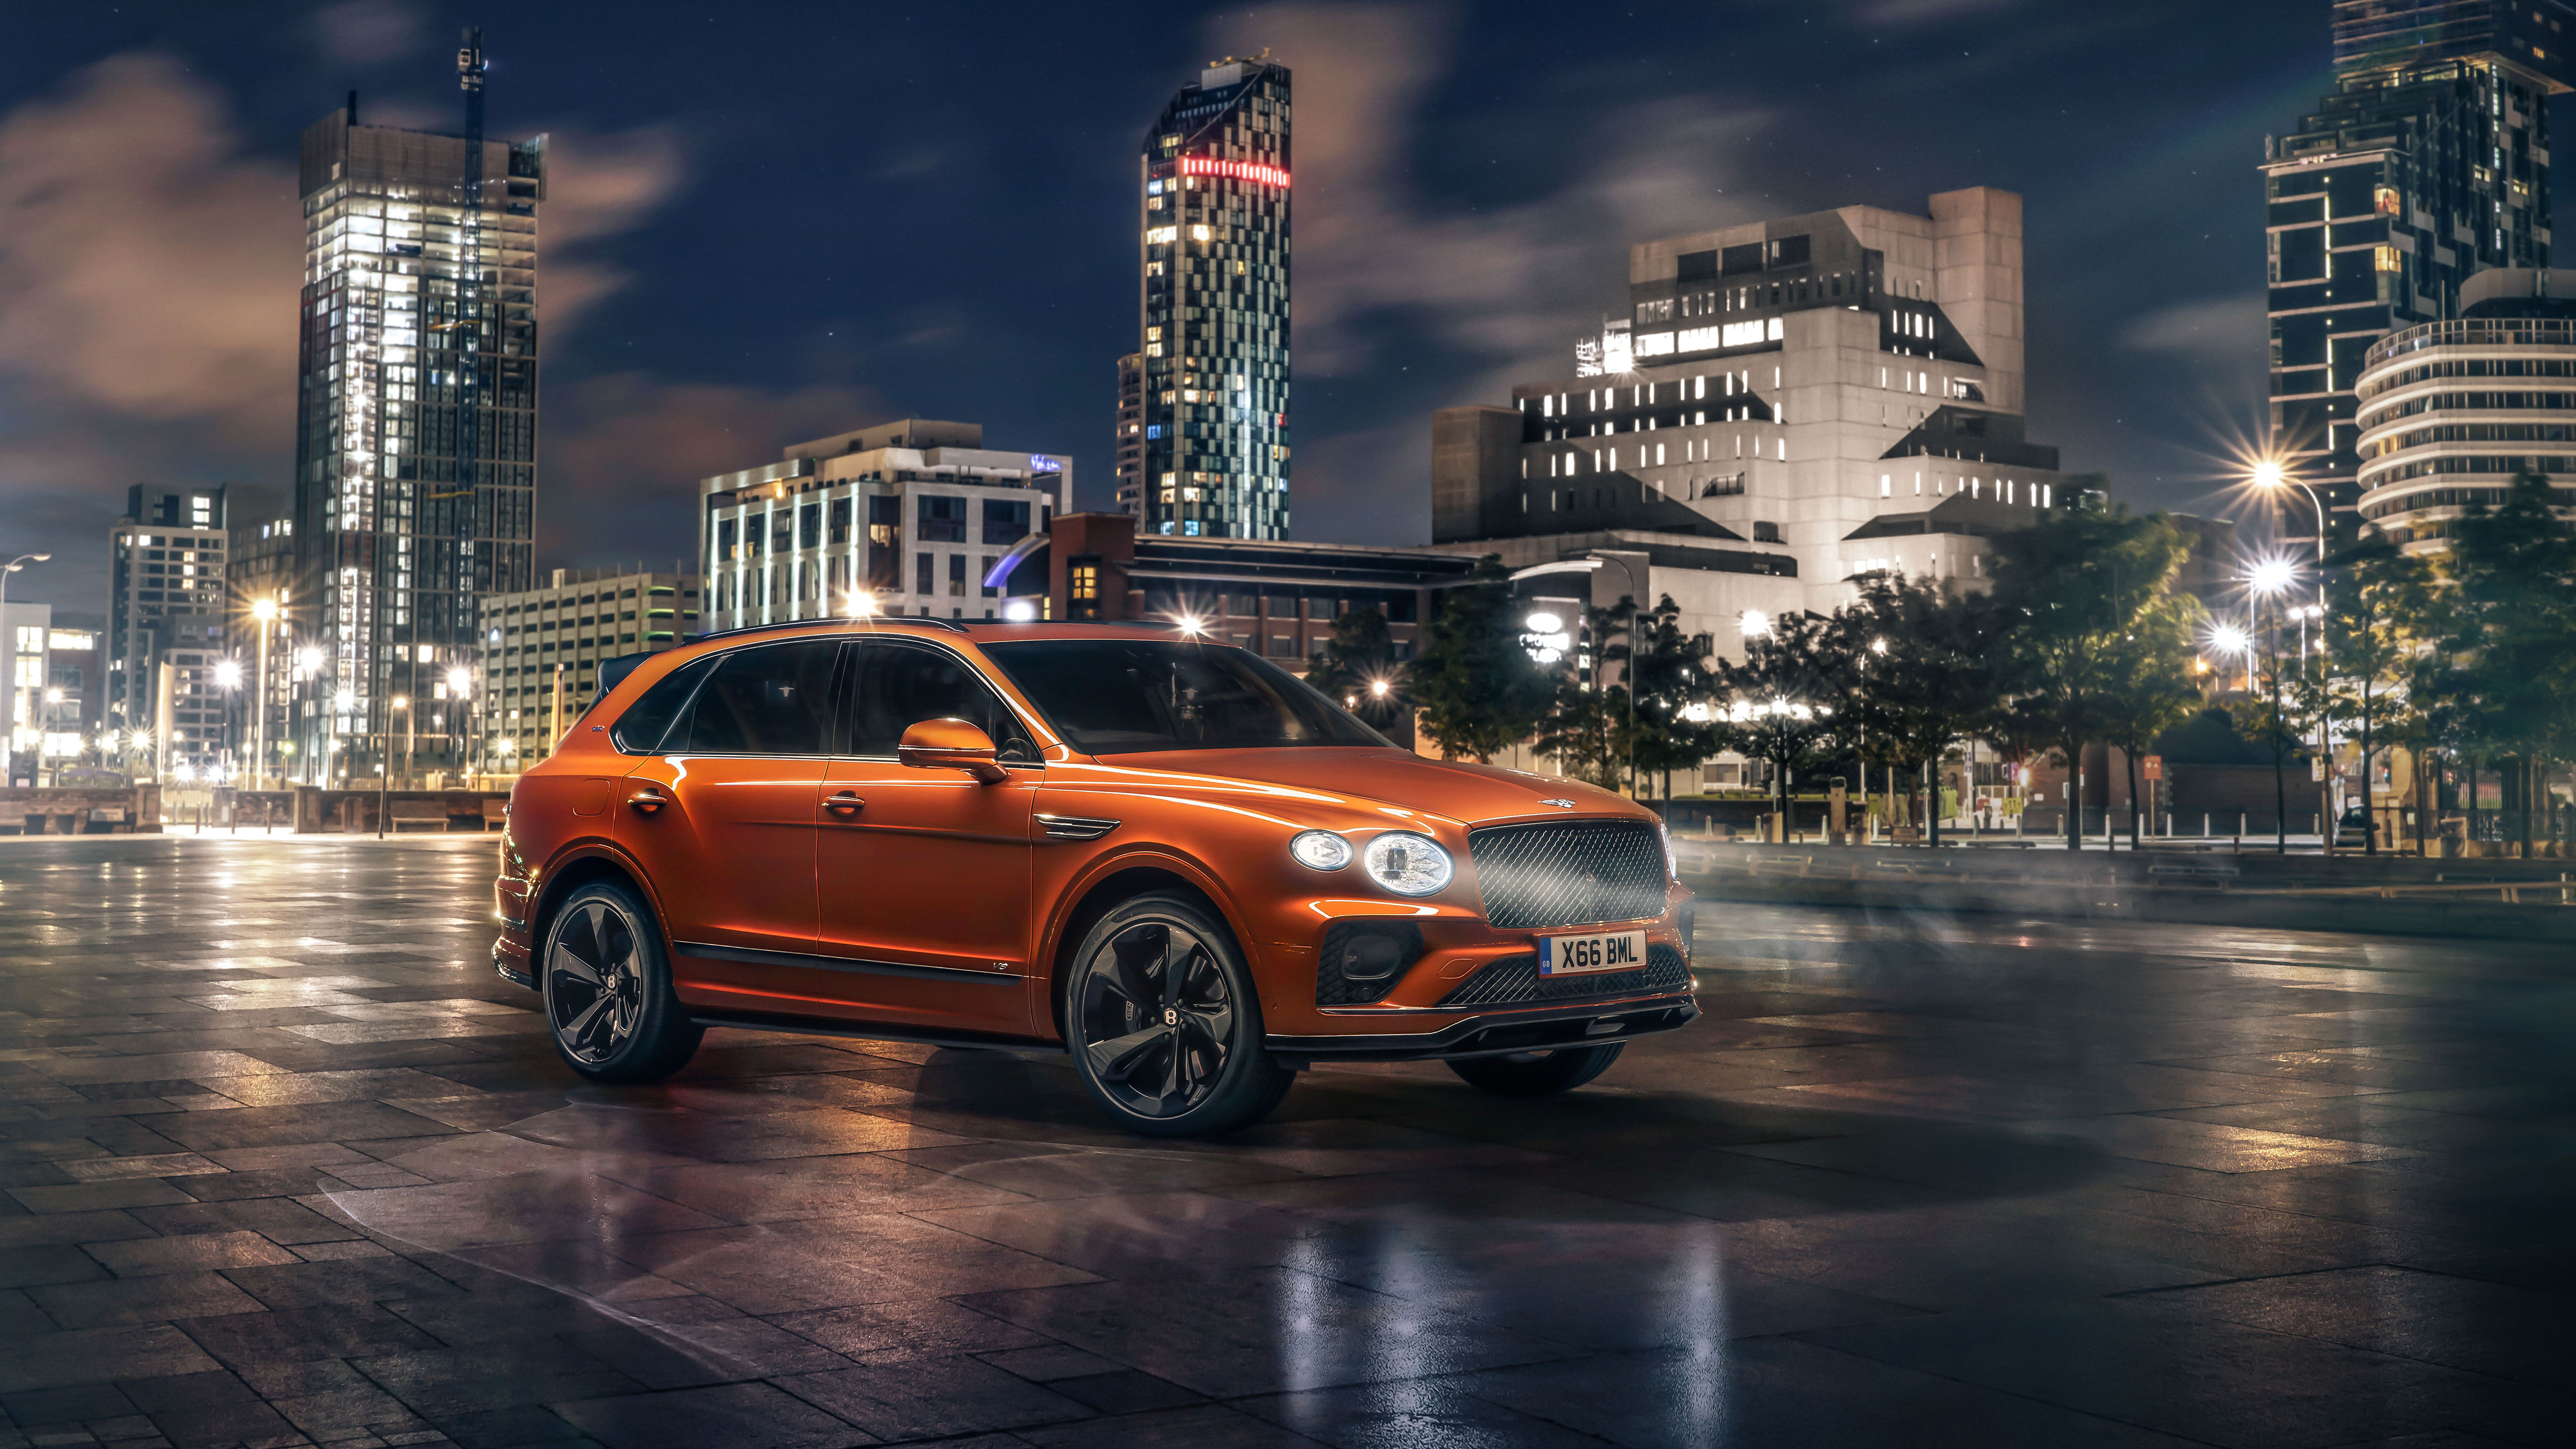 Bentley Bentayga V8 First Edition 2020 5k 2 Wallpaper Hd Car Wallpapers Id 15576